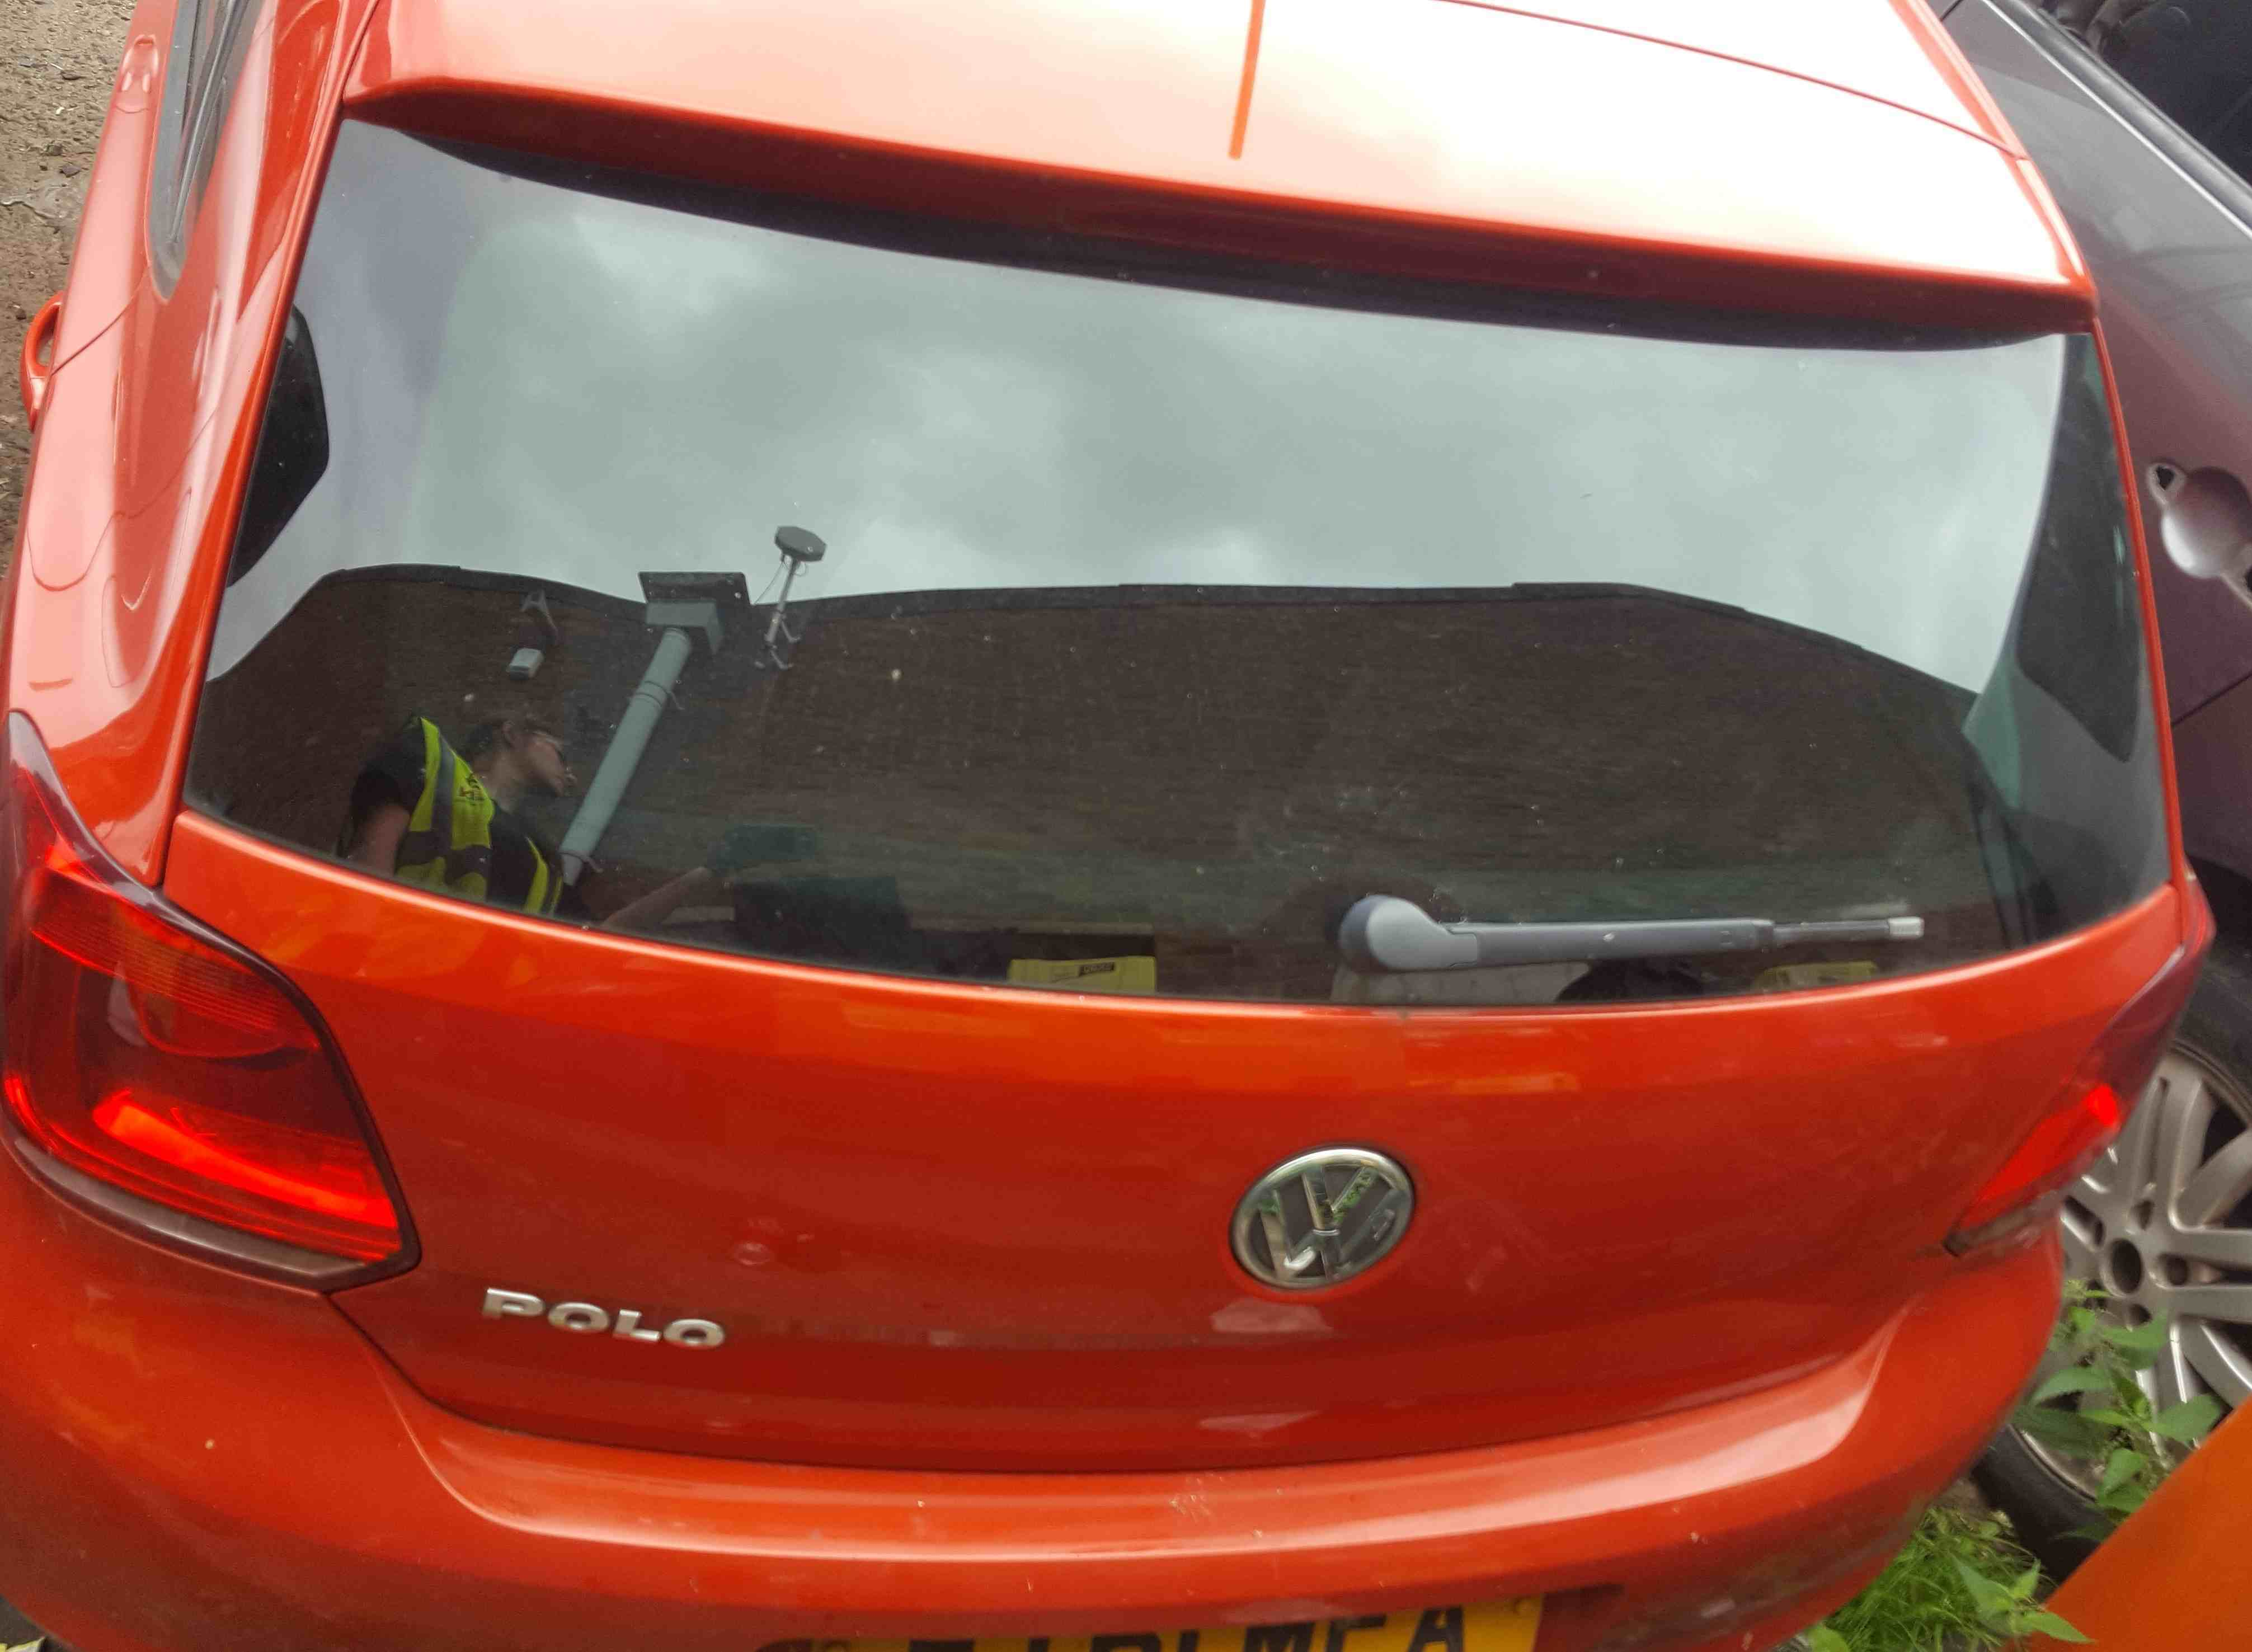 Volkswagen Polo 6R 2009-2014 Rear Tailgate Boot Orange LD2Z